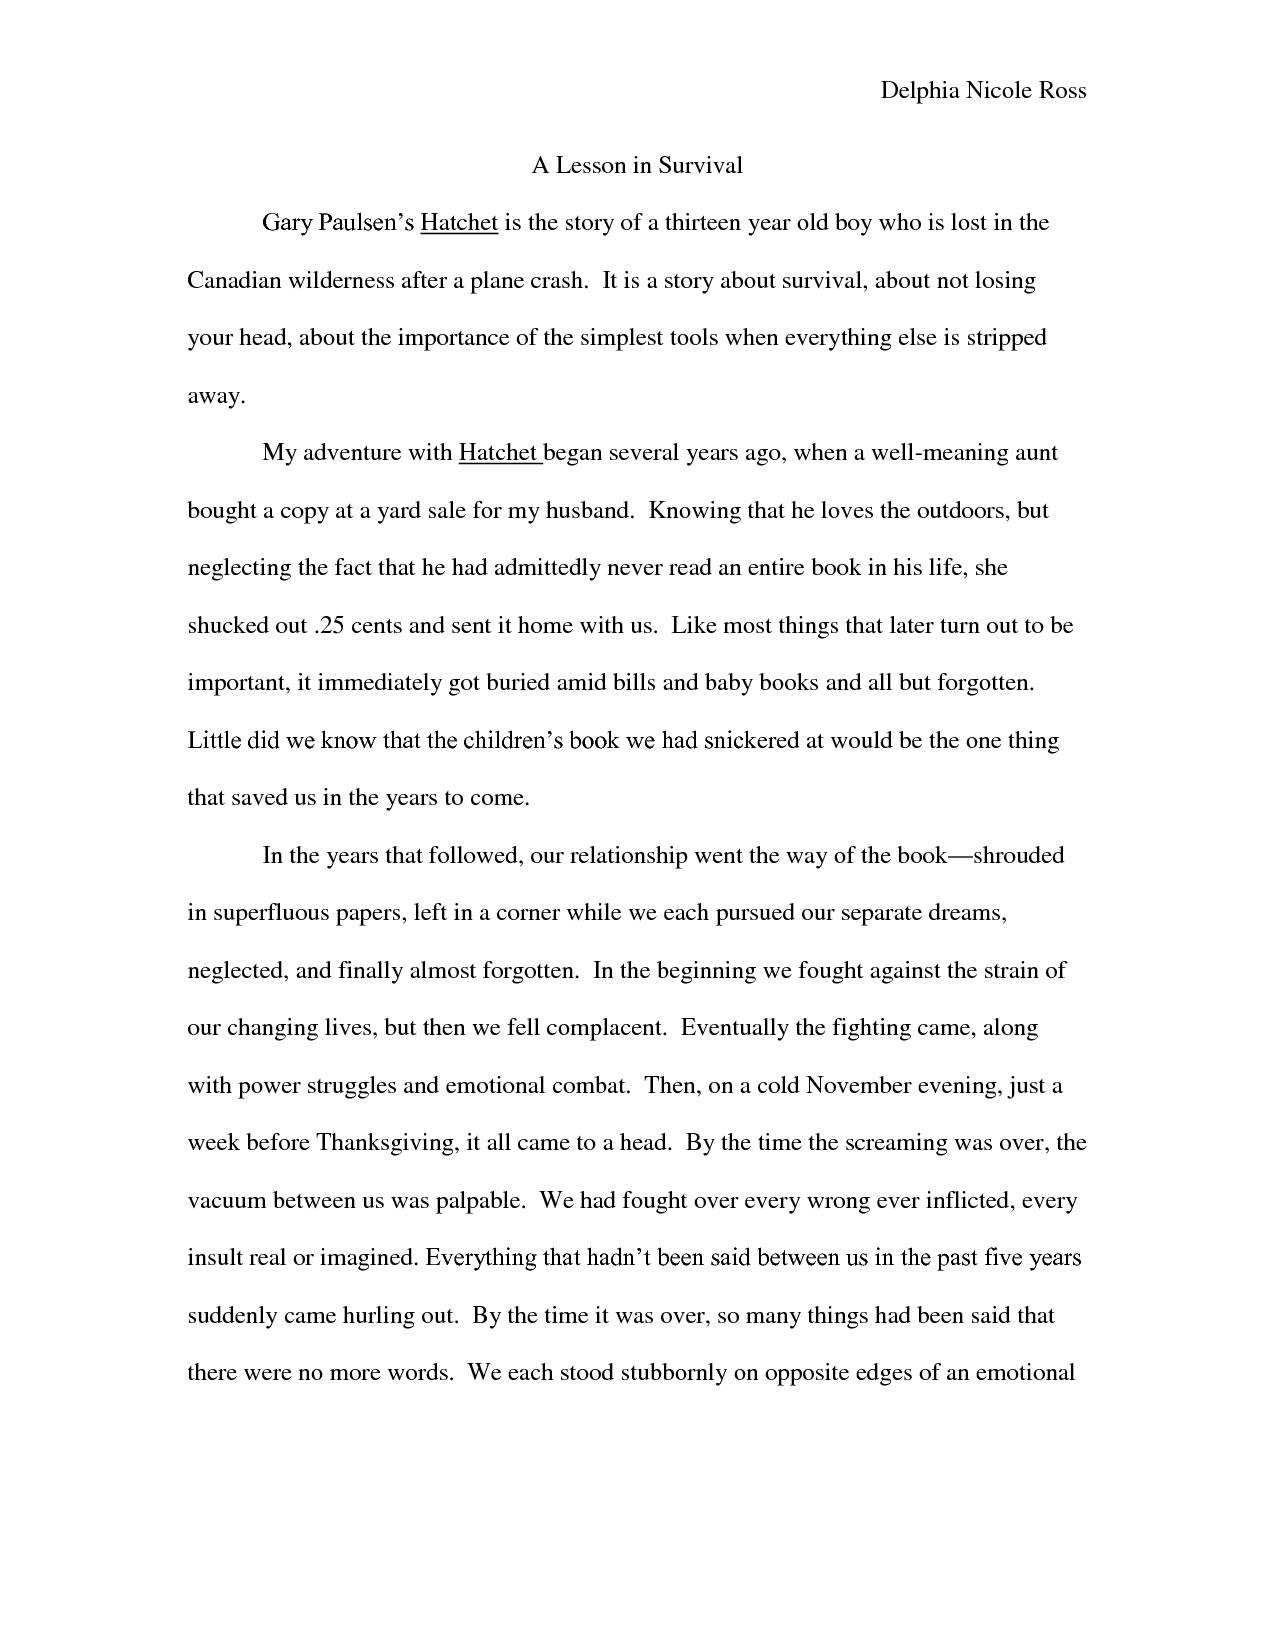 Hatchet Gary Paulsen Book Summary